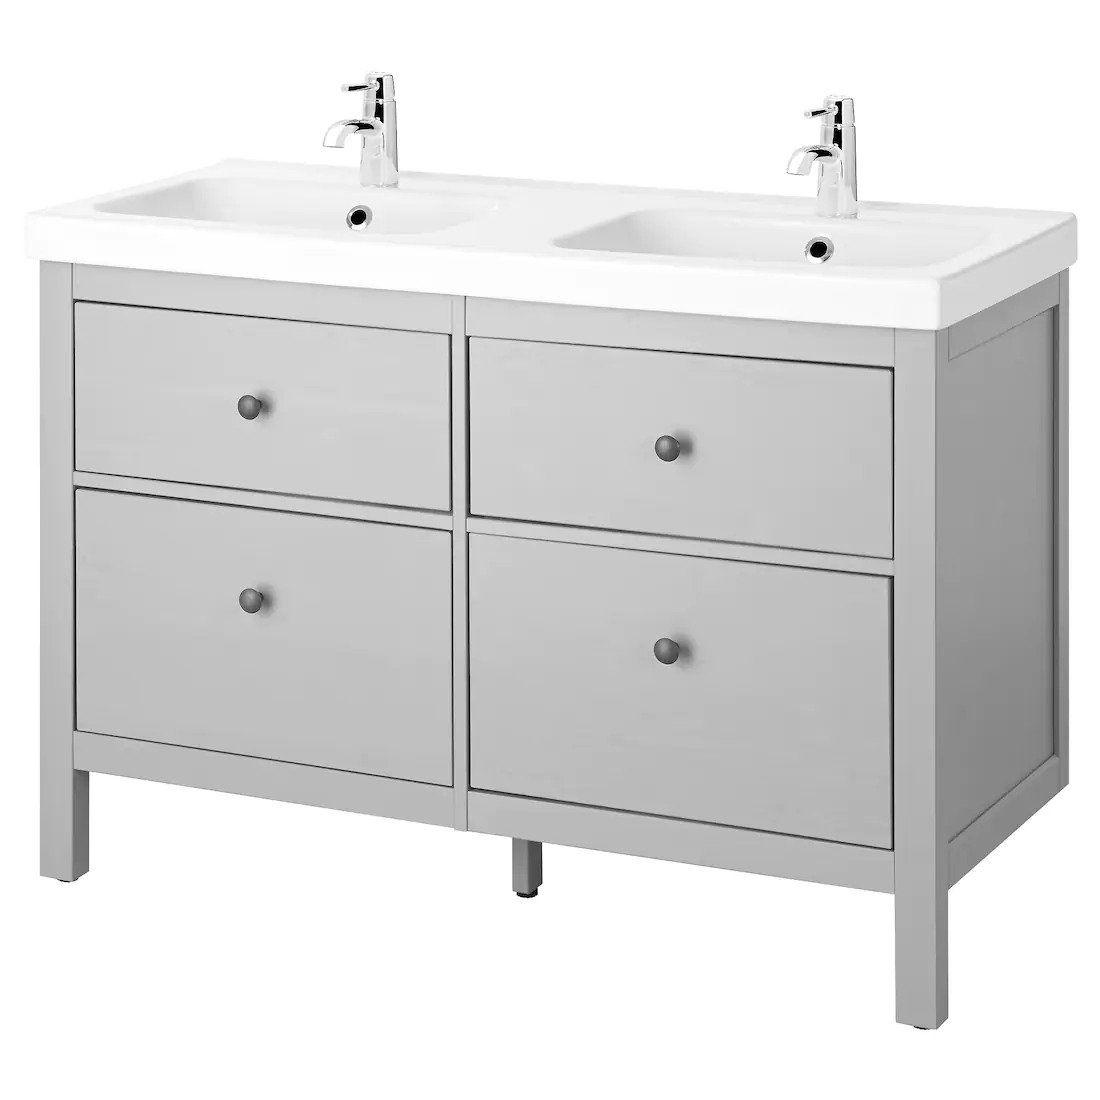 IKEA HEMNES Sink Cabinet